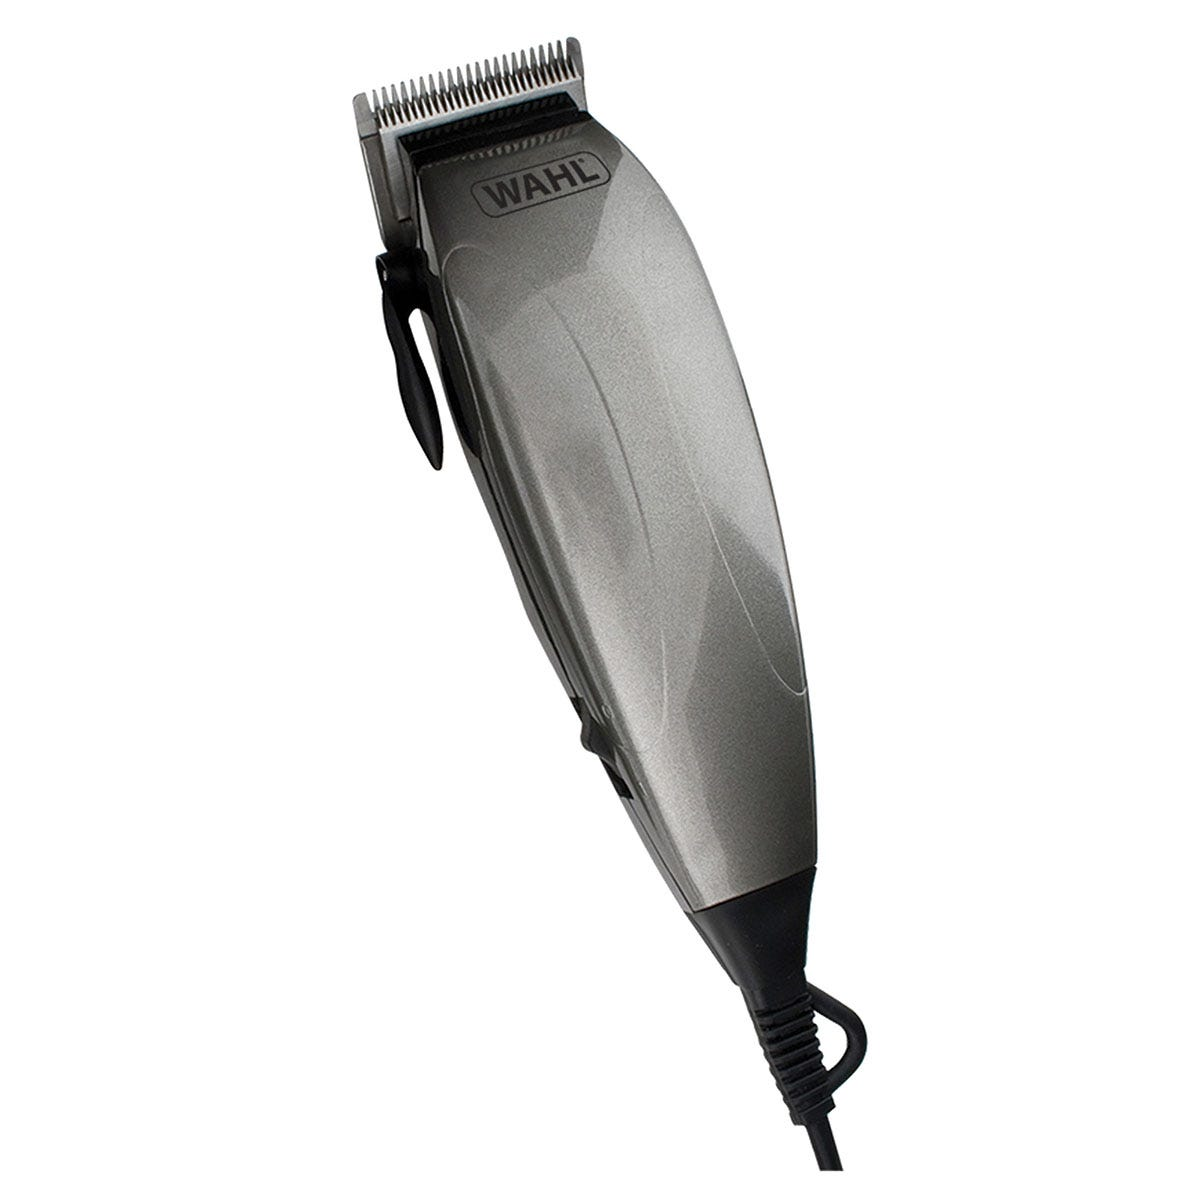 Wahl 79305-2317 Vari Clip Corded Hair Clipper Kit - Silver